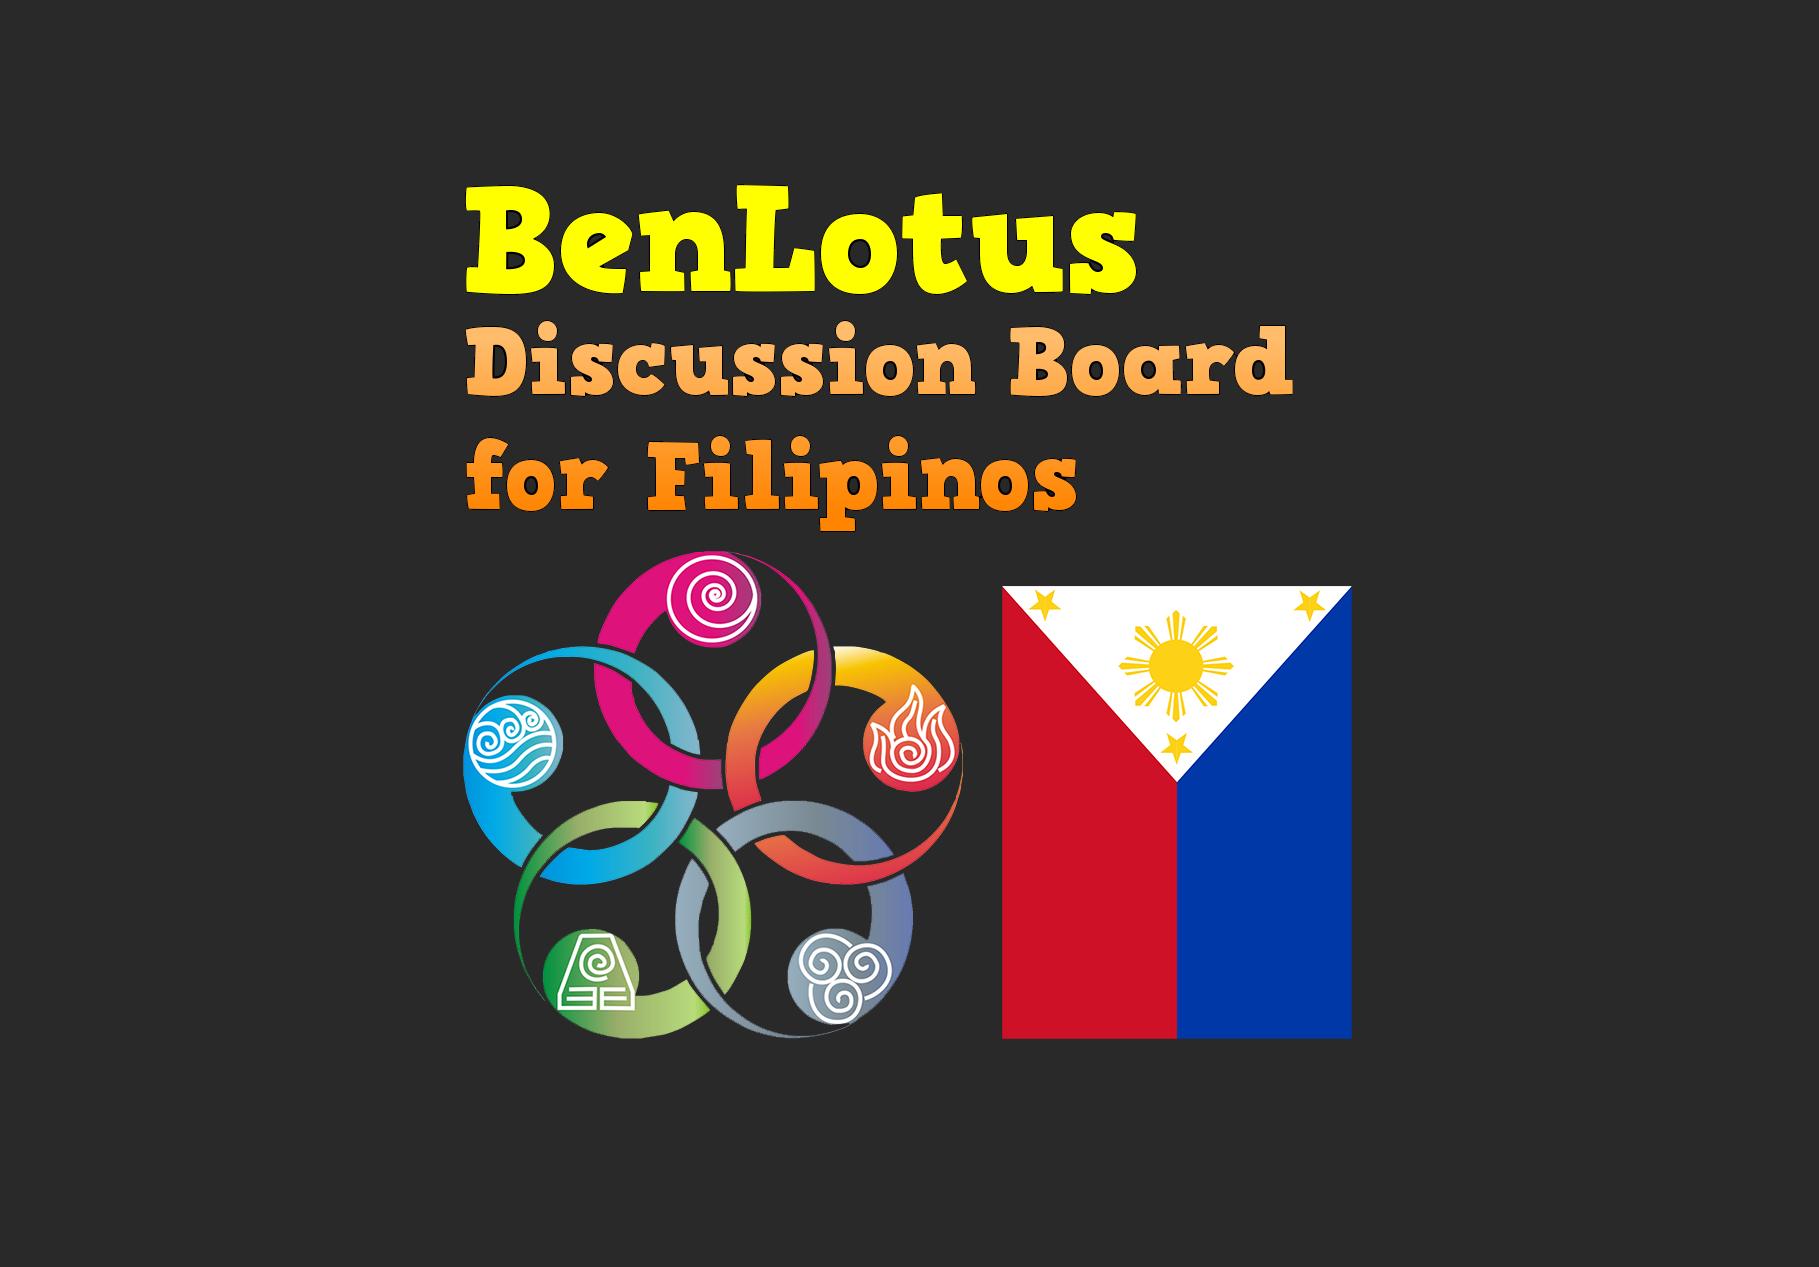 LG - BenLotus Discussion Board